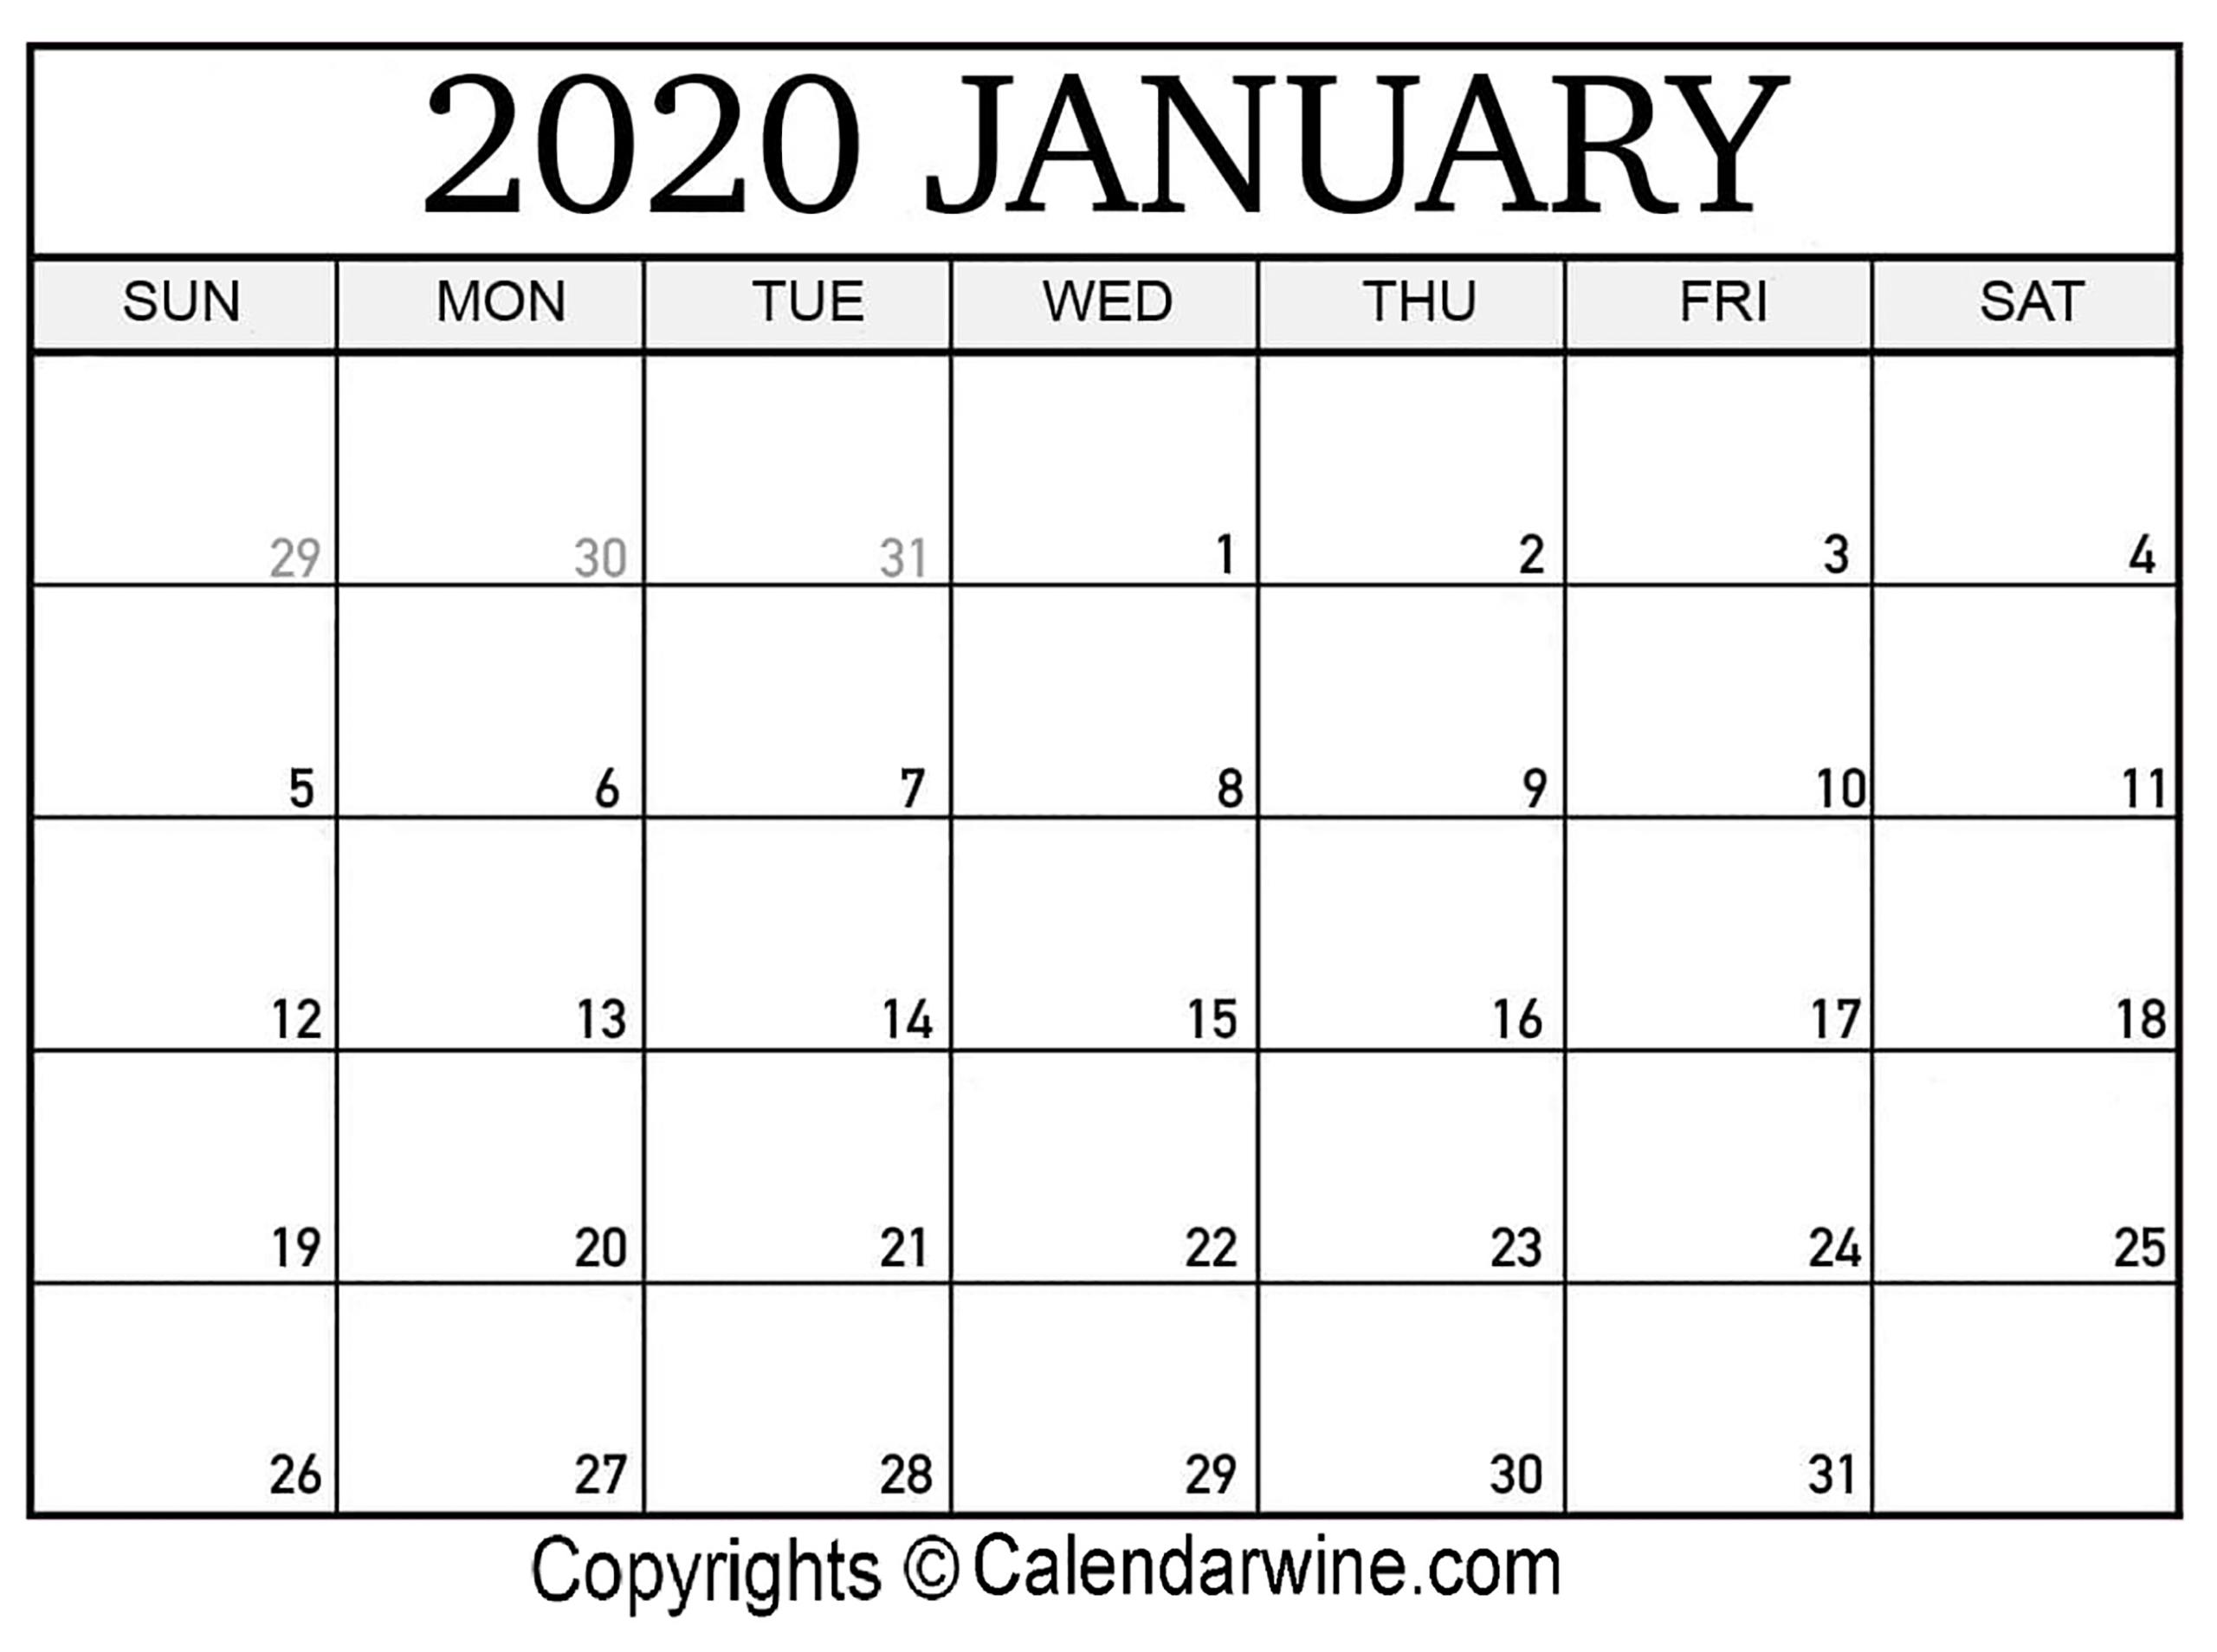 January 2020 Printable Calendar Templates | Calendar Wine